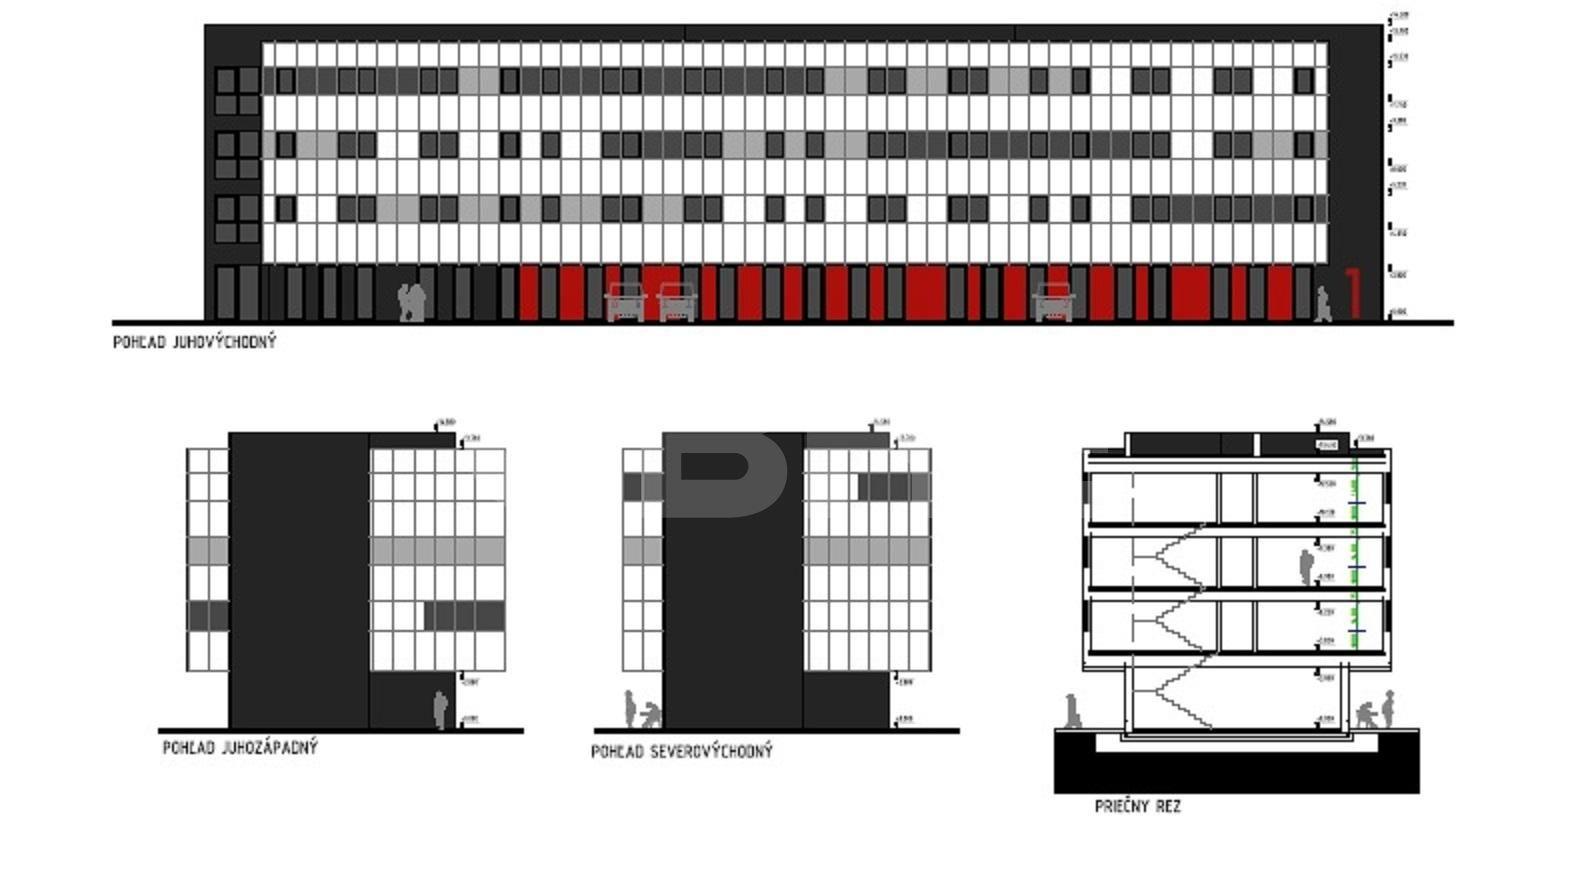 Autoparky Zohor Park - Hall 05, Bratislava Region, Zohor | Warehouses for rent or sale by CBRE | 2